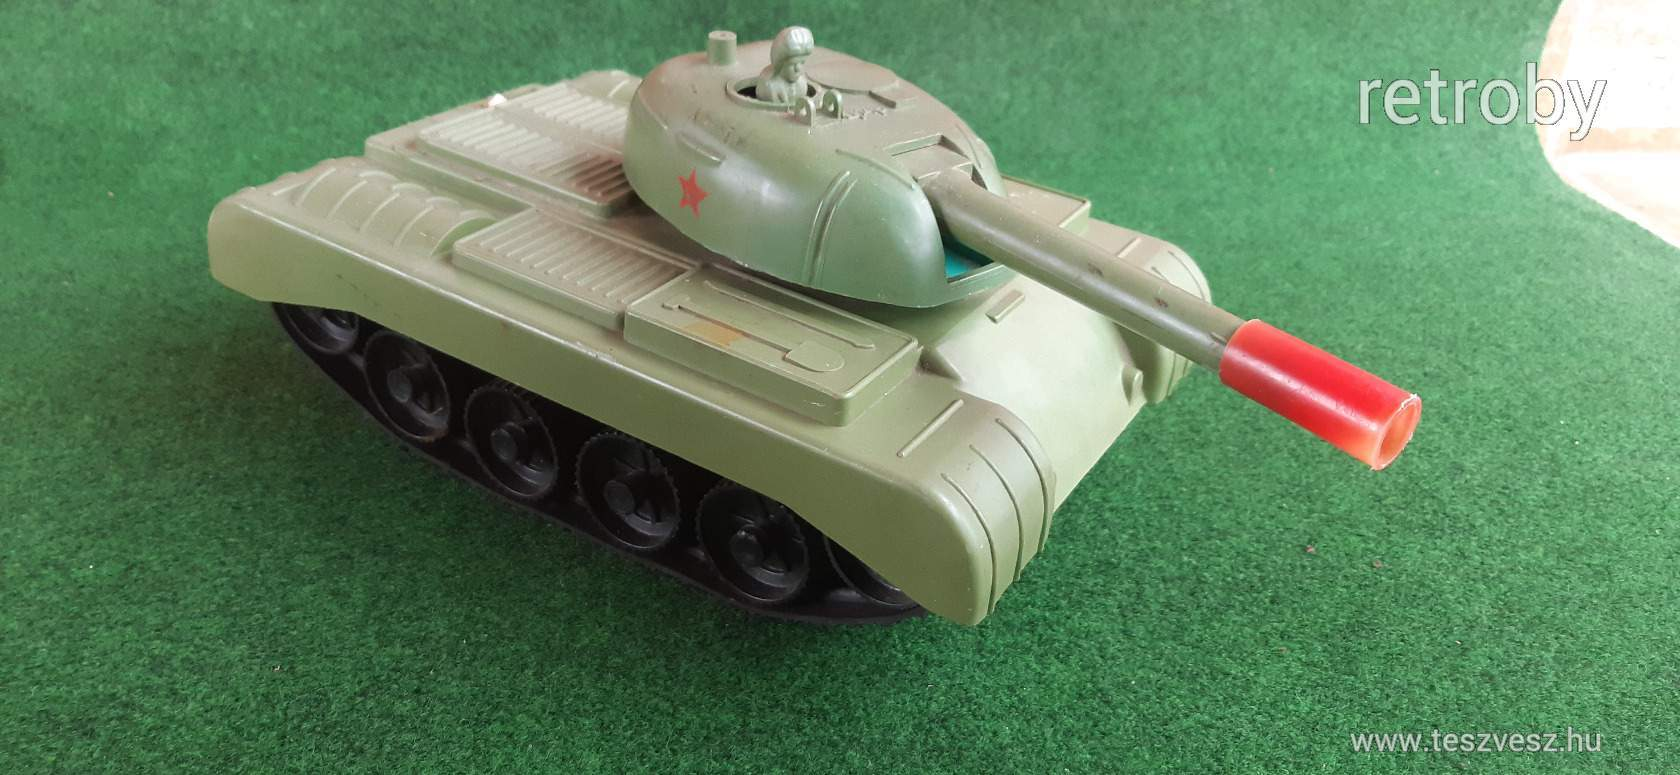 retro-elemes-orosz-harckocsi-f7ca_2_big.jpg